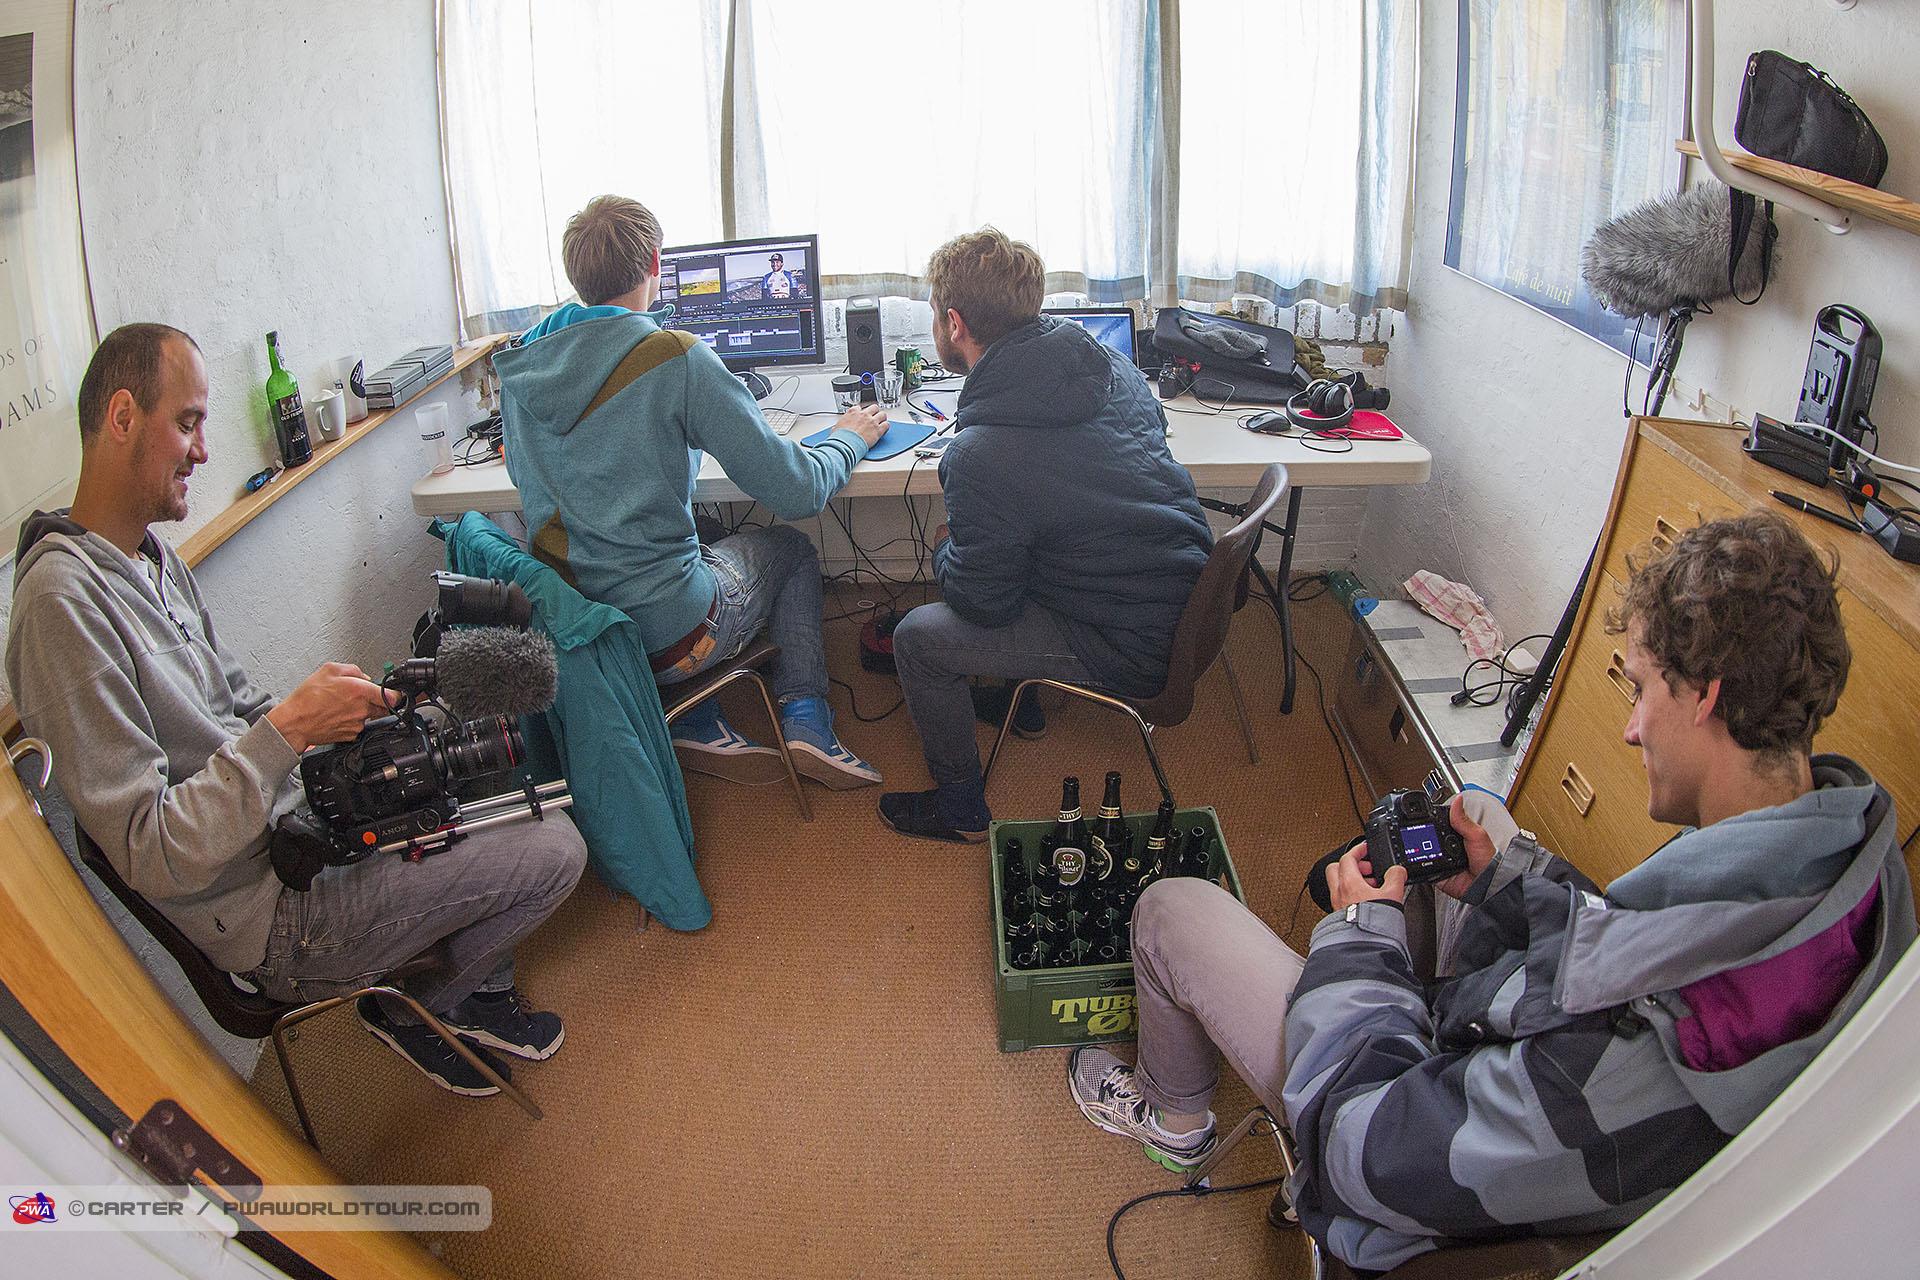 DK15_ls_TV_crew_at_work.jpg